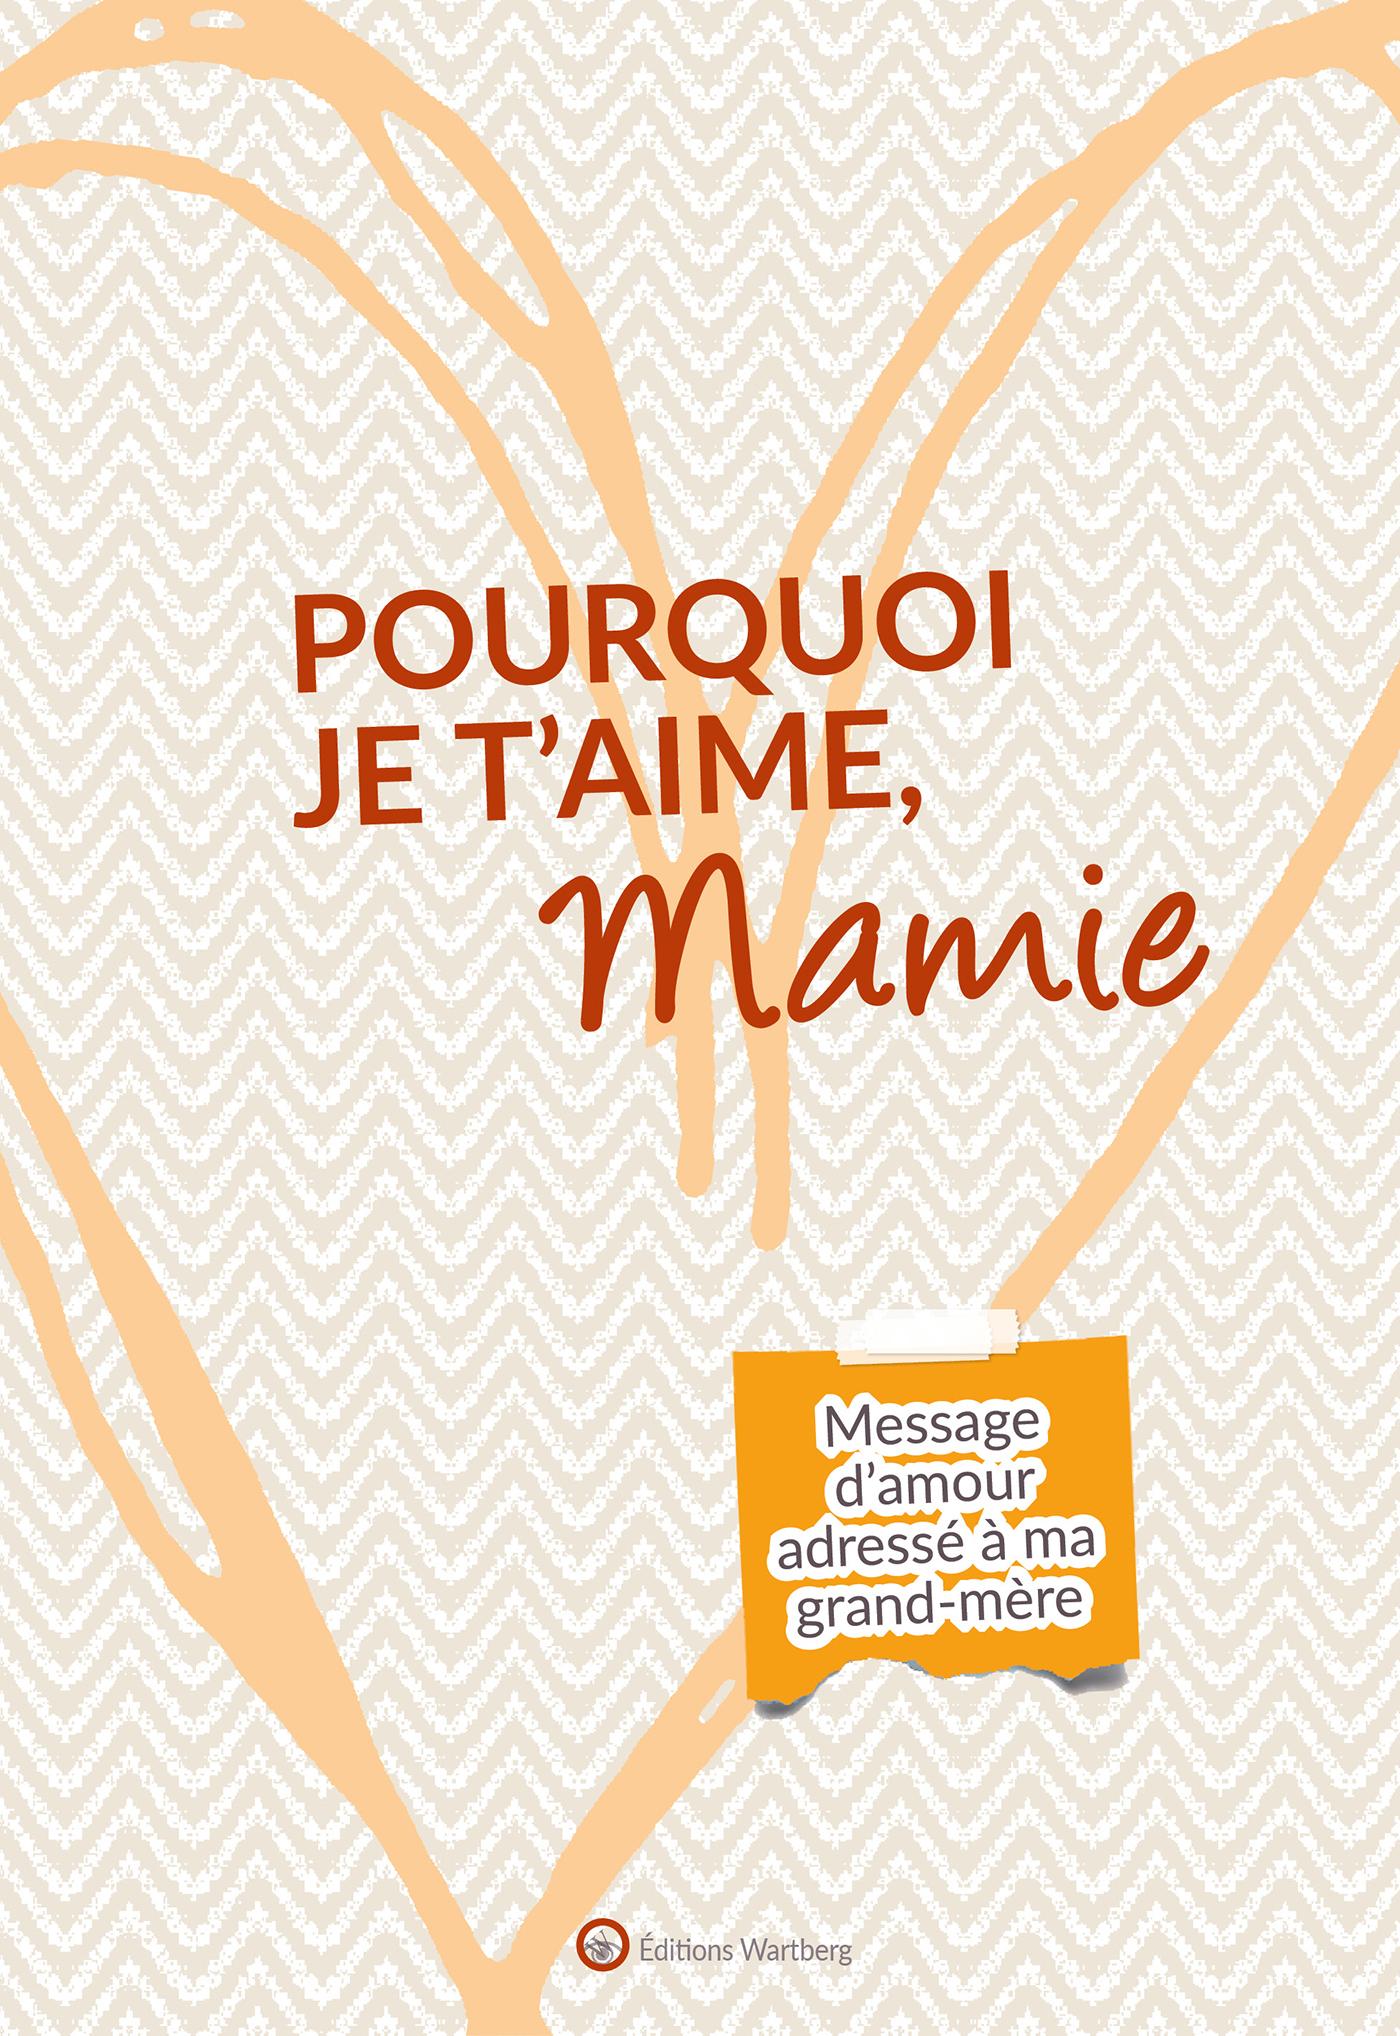 POURQUOI JE T'AIME, MAMIE - MESSAGE D'AMOUR ADRESSE A MA GRAND-MERE